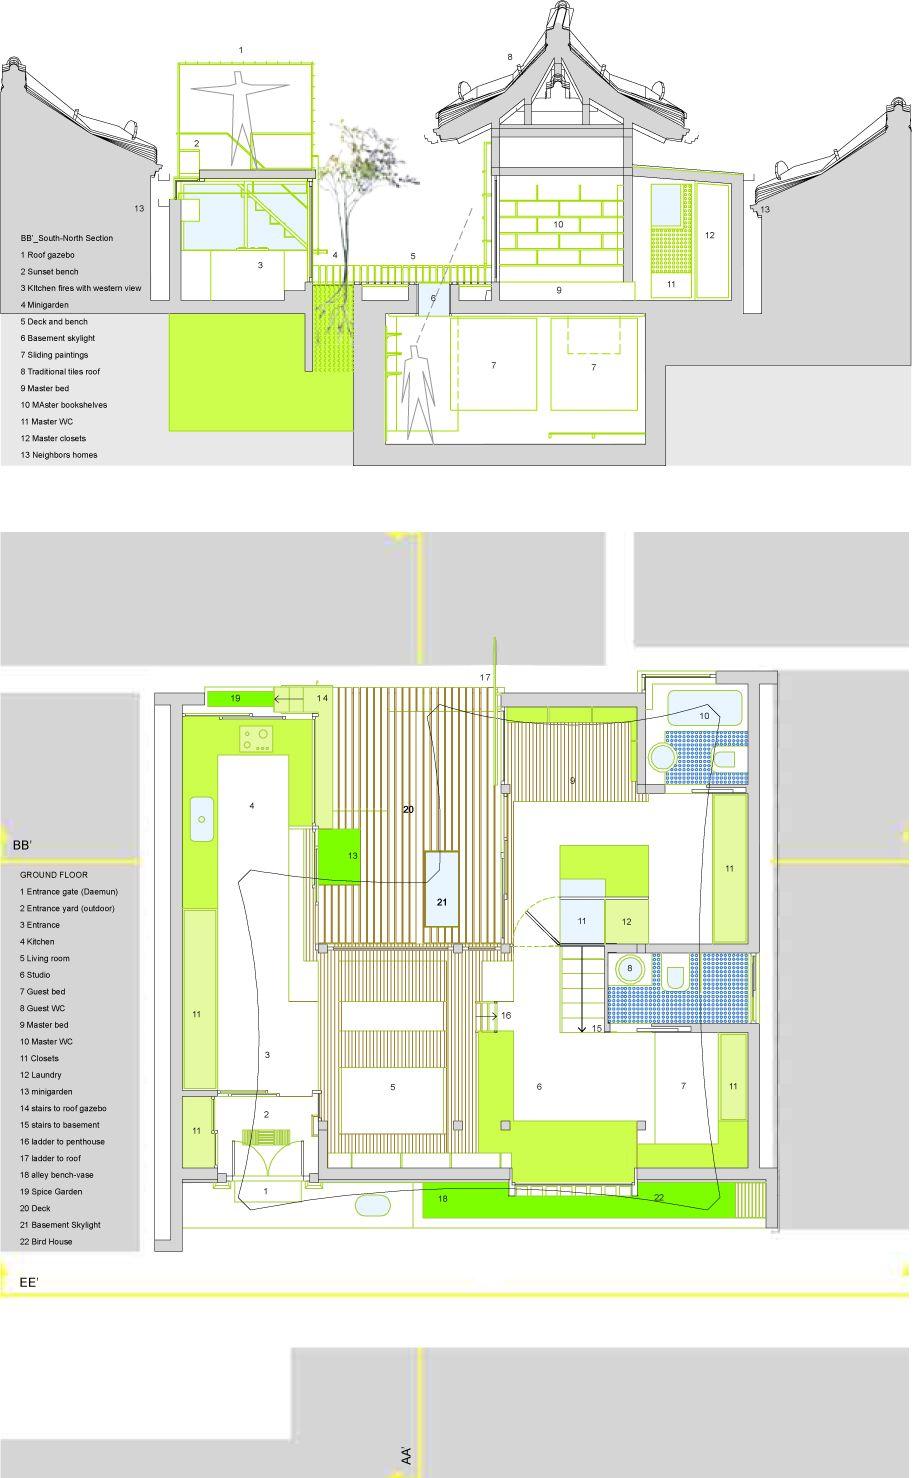 Korean house layout | House plans and ideas | Pinterest | House ...